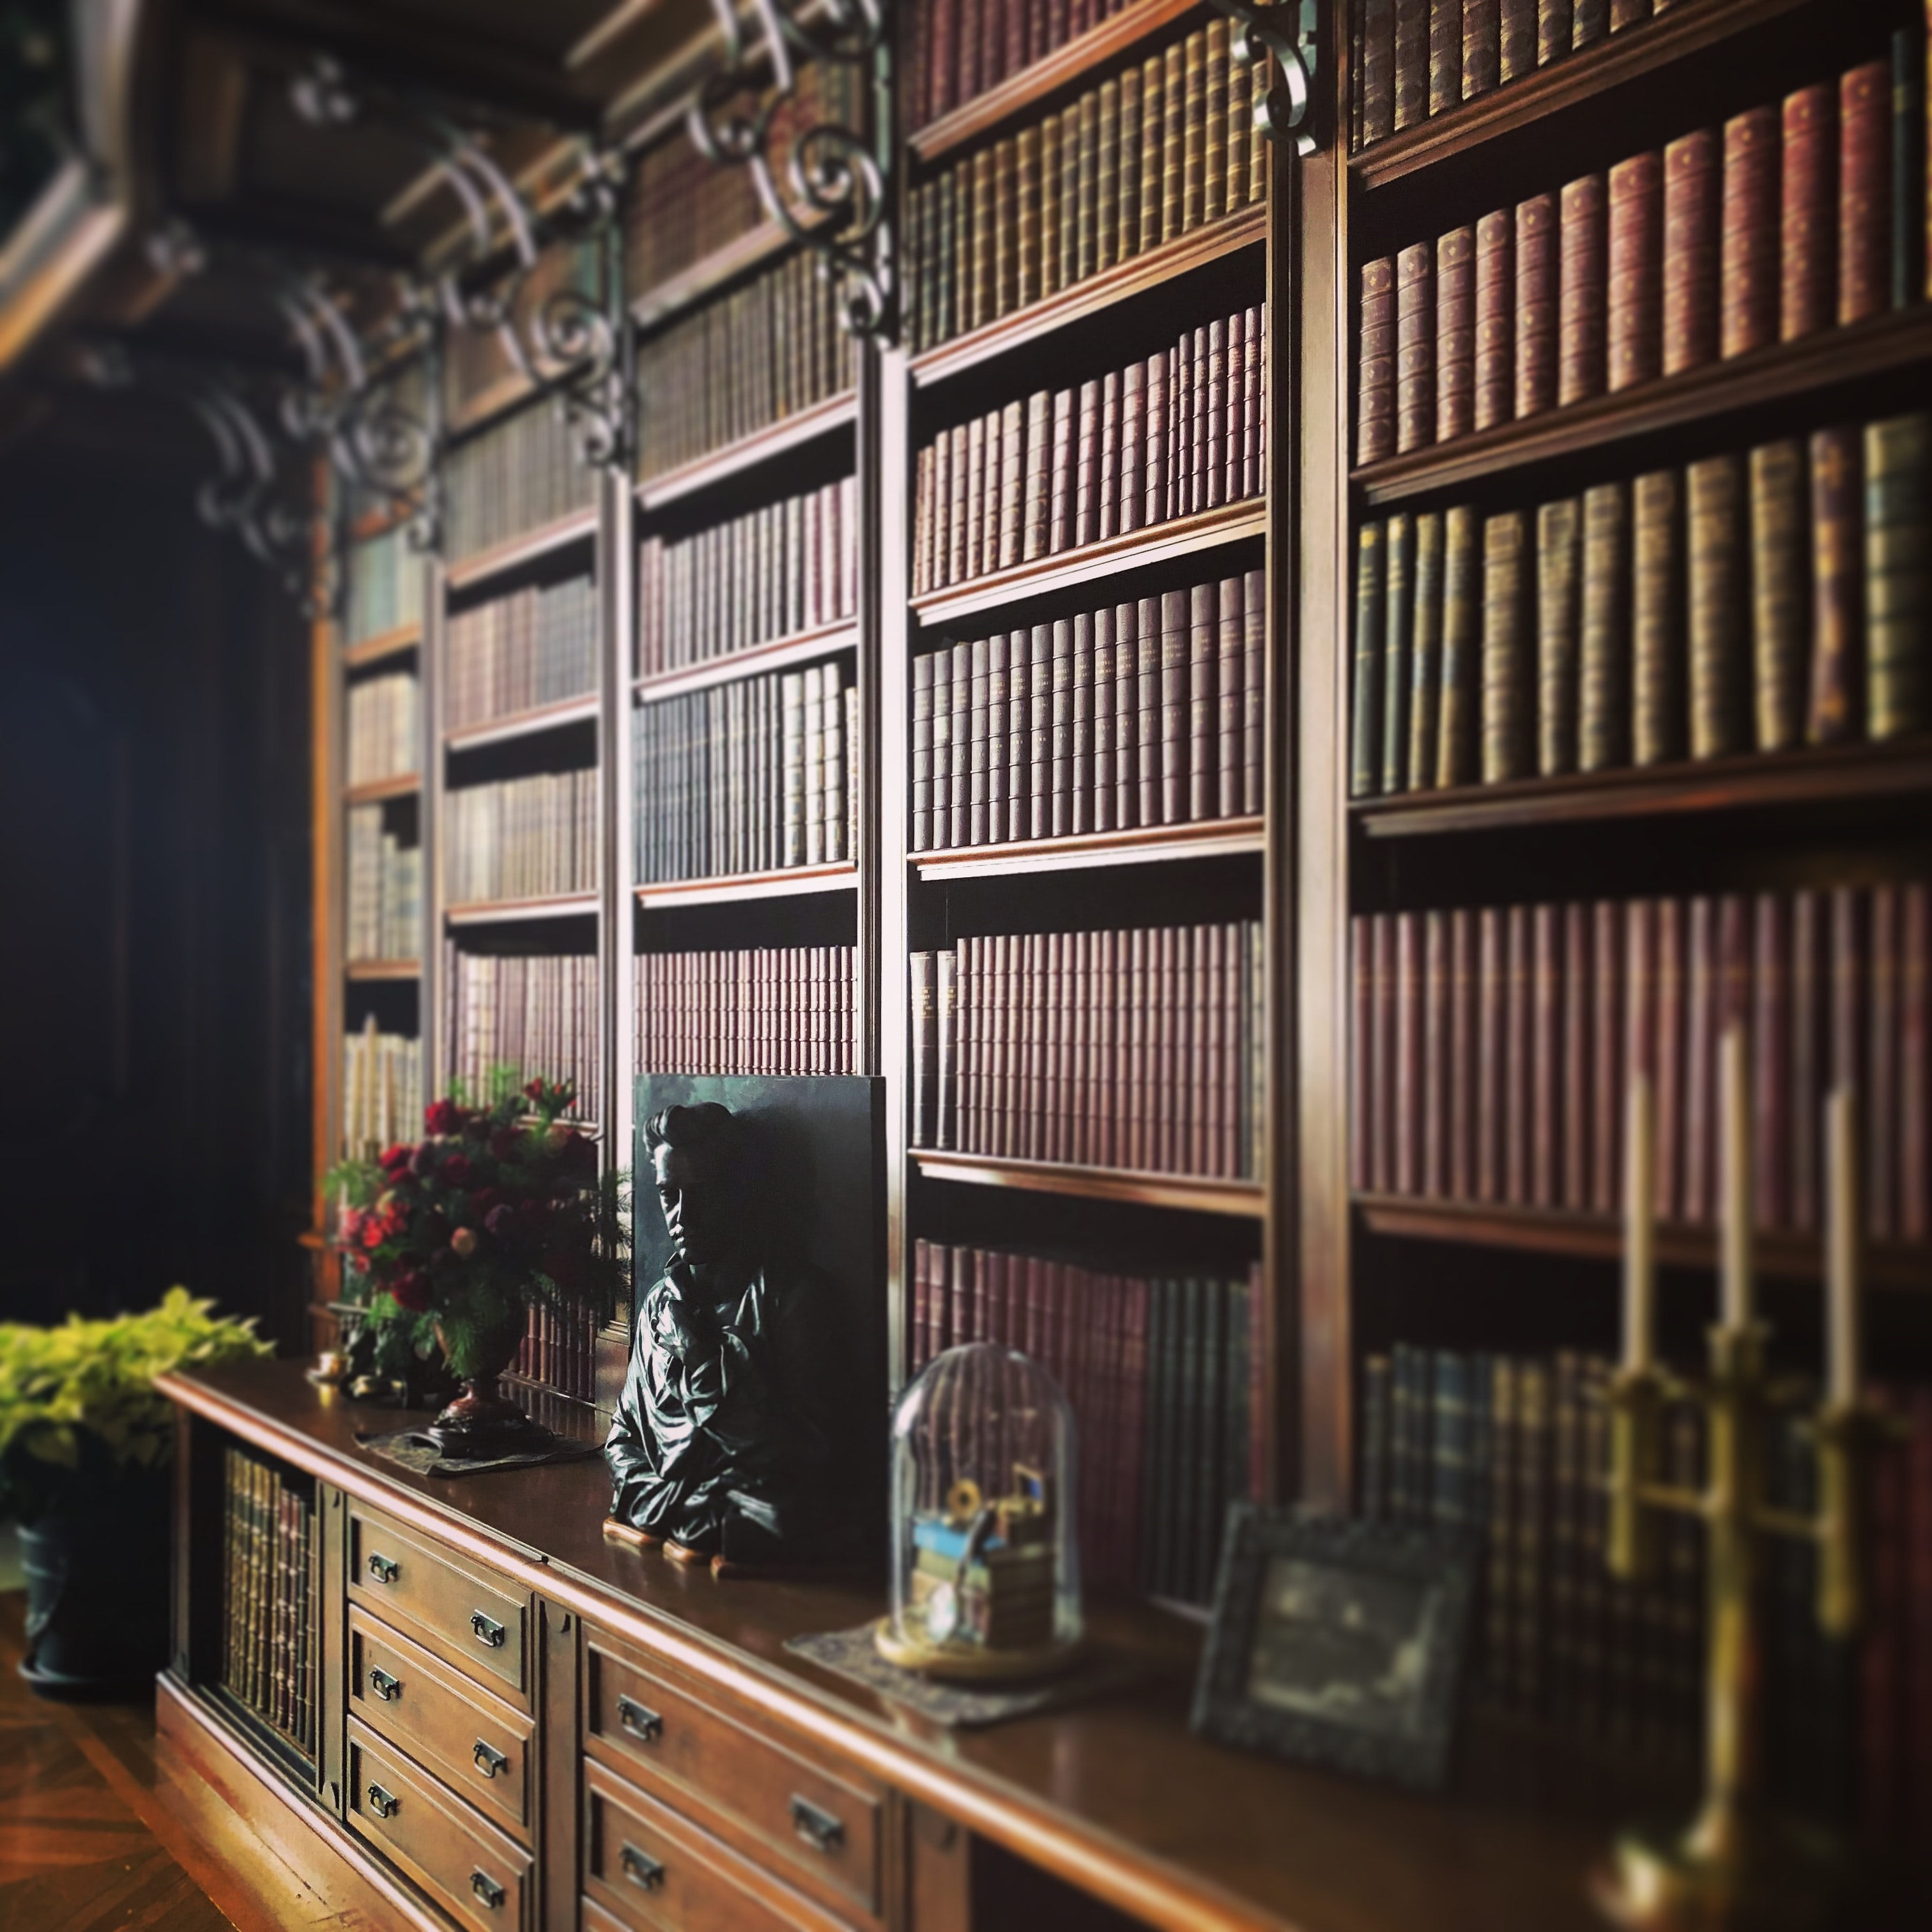 books in brown bookshelf